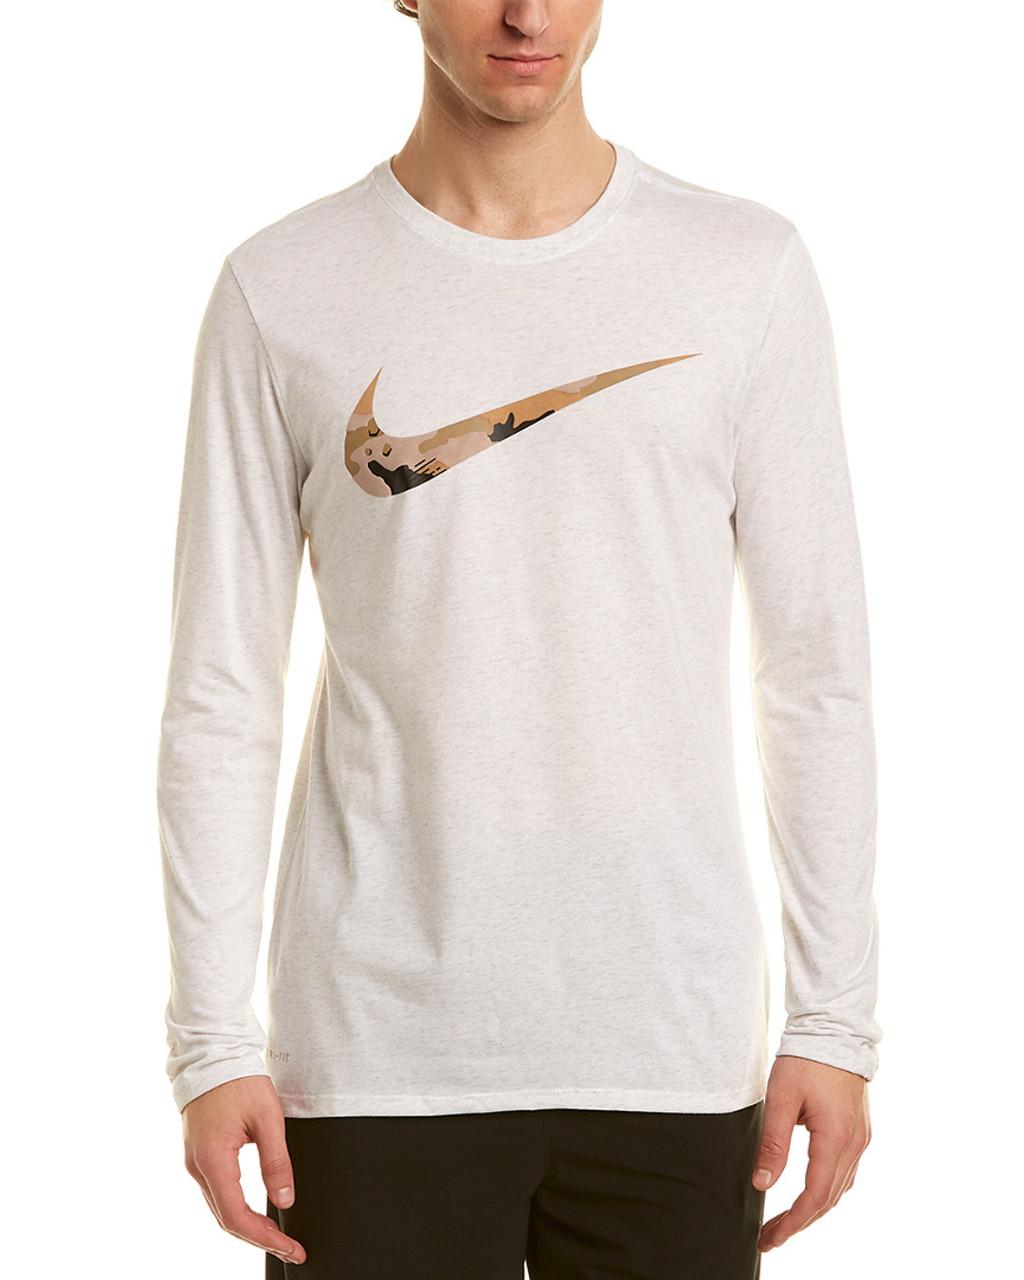 cbf63c20 Nike Dry Camo Swish T-Shirt~1211724450 - Carsons